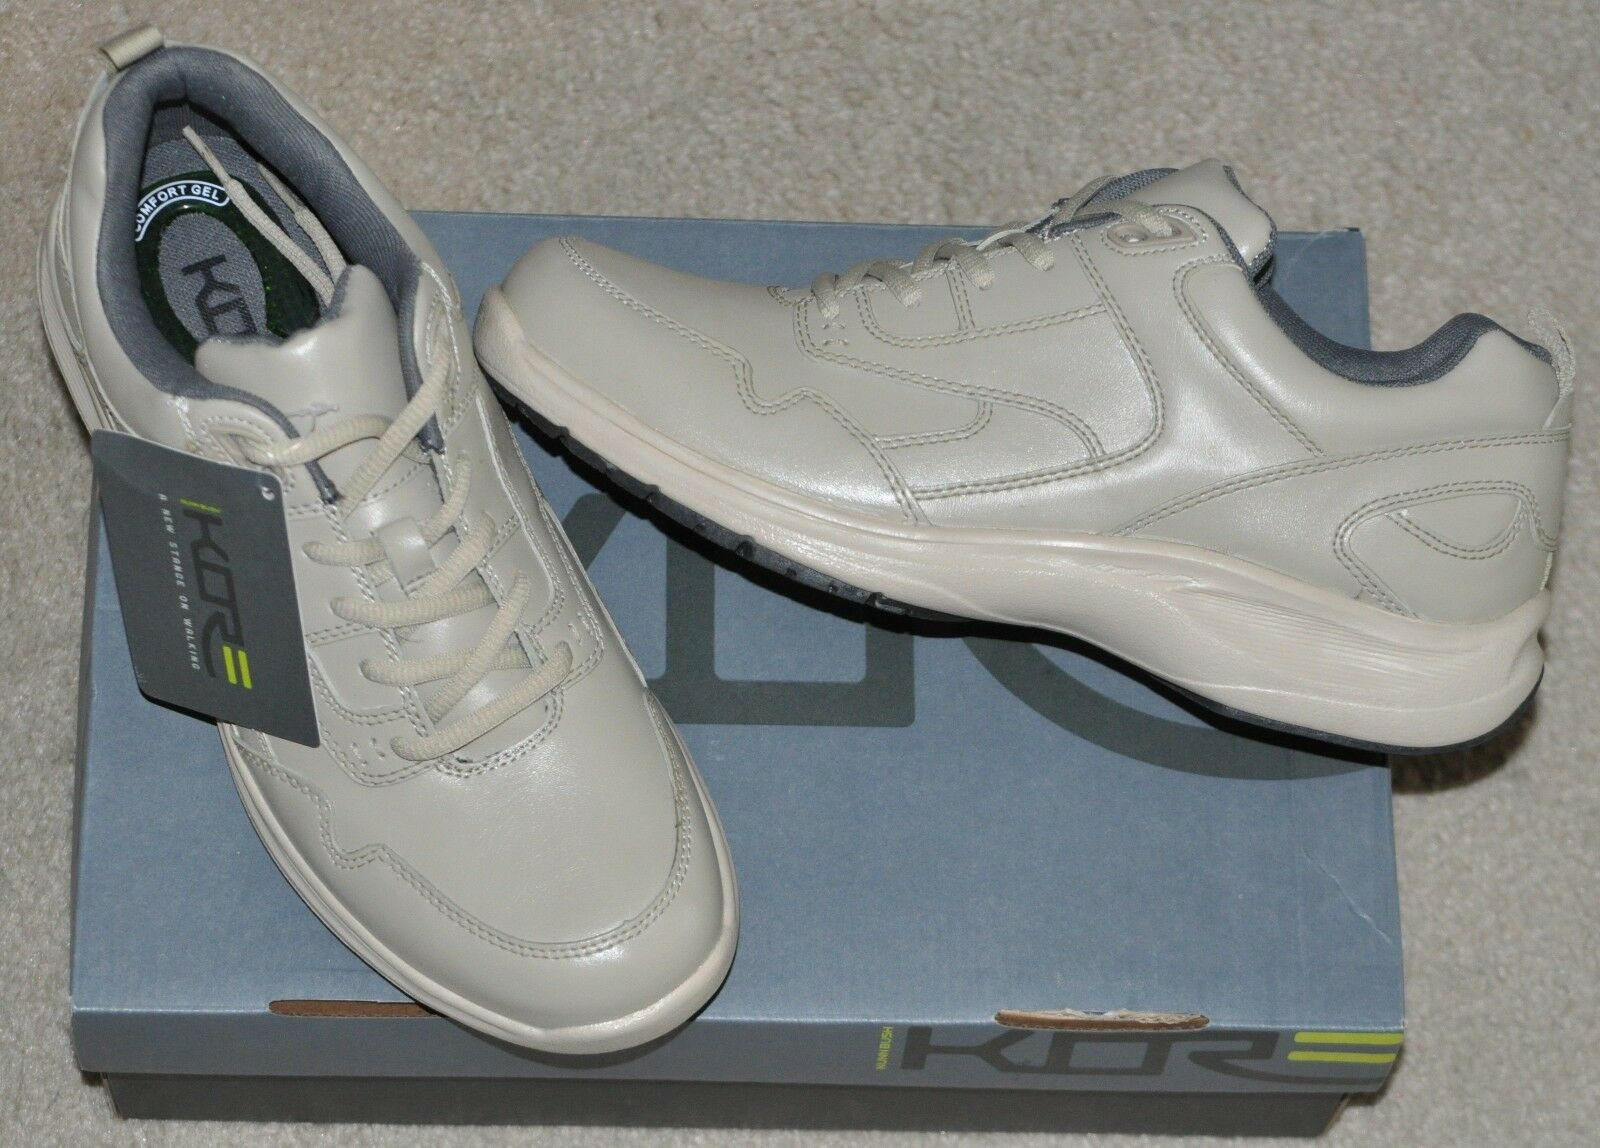 Nunn Bush Prosper Leather Walking shoes Brand New in Original Box Sz 10.5